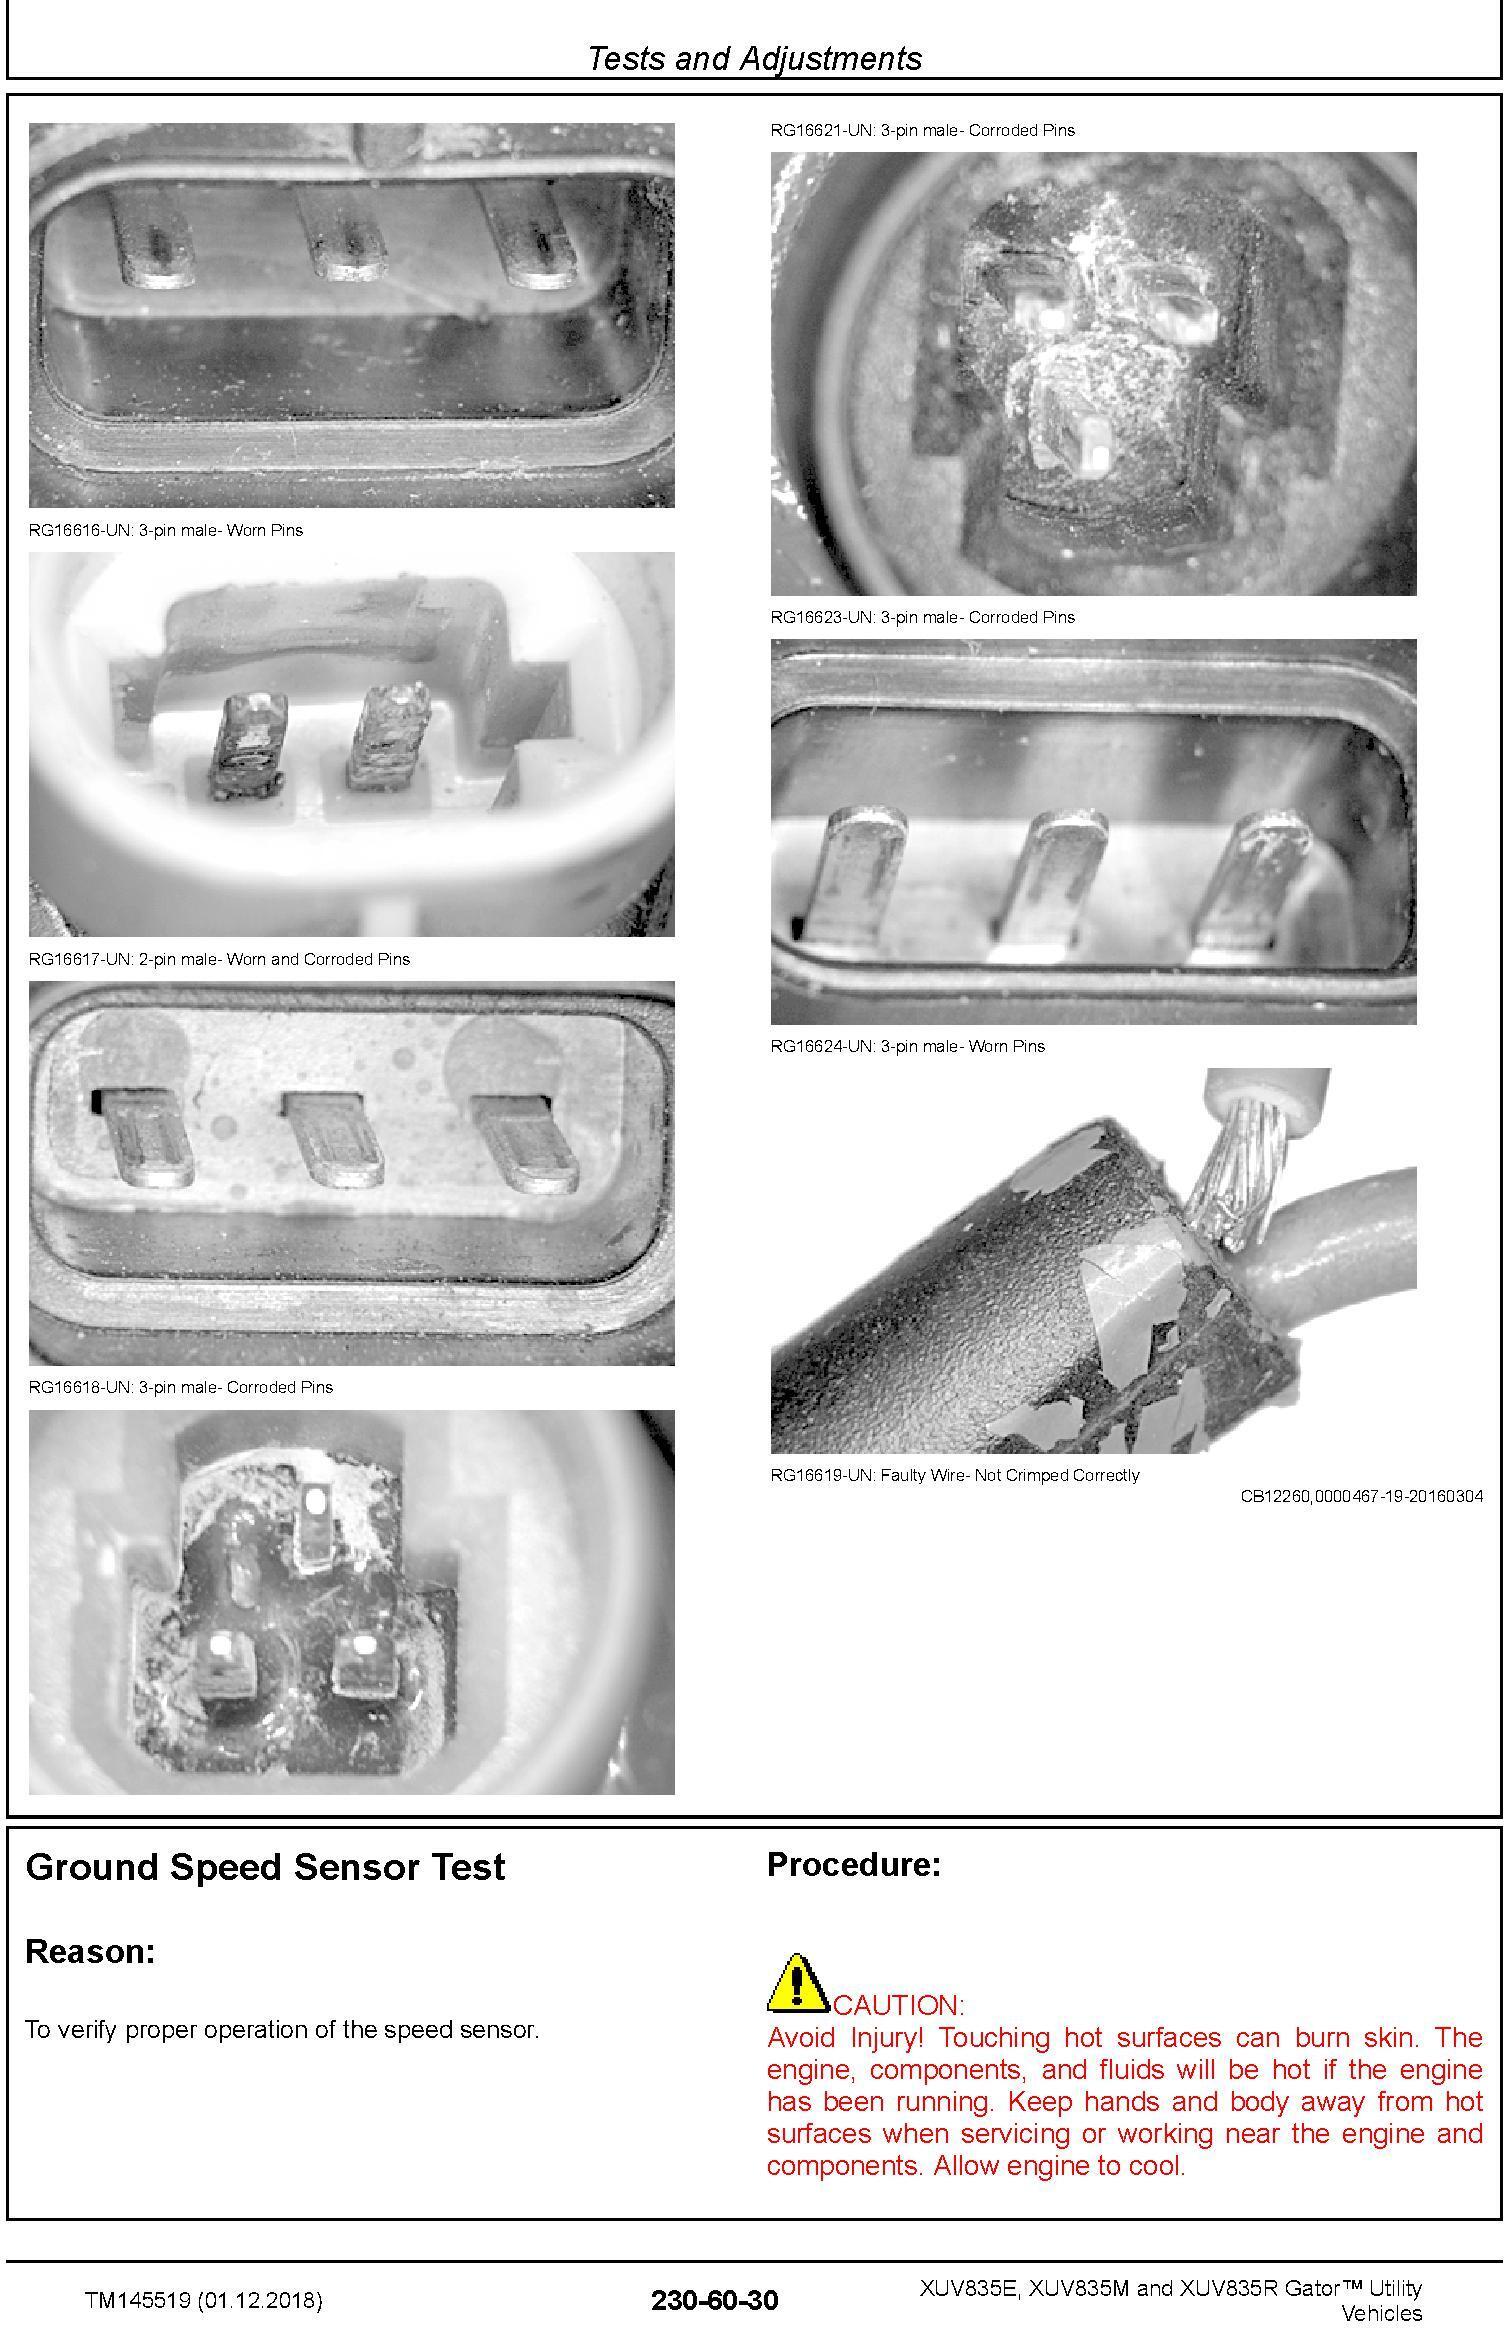 John Deere XUV835E, XUV835M, XUV835R Gator Utility Vehicles (SN.010001-) Technical Manual (TM145519) - 2